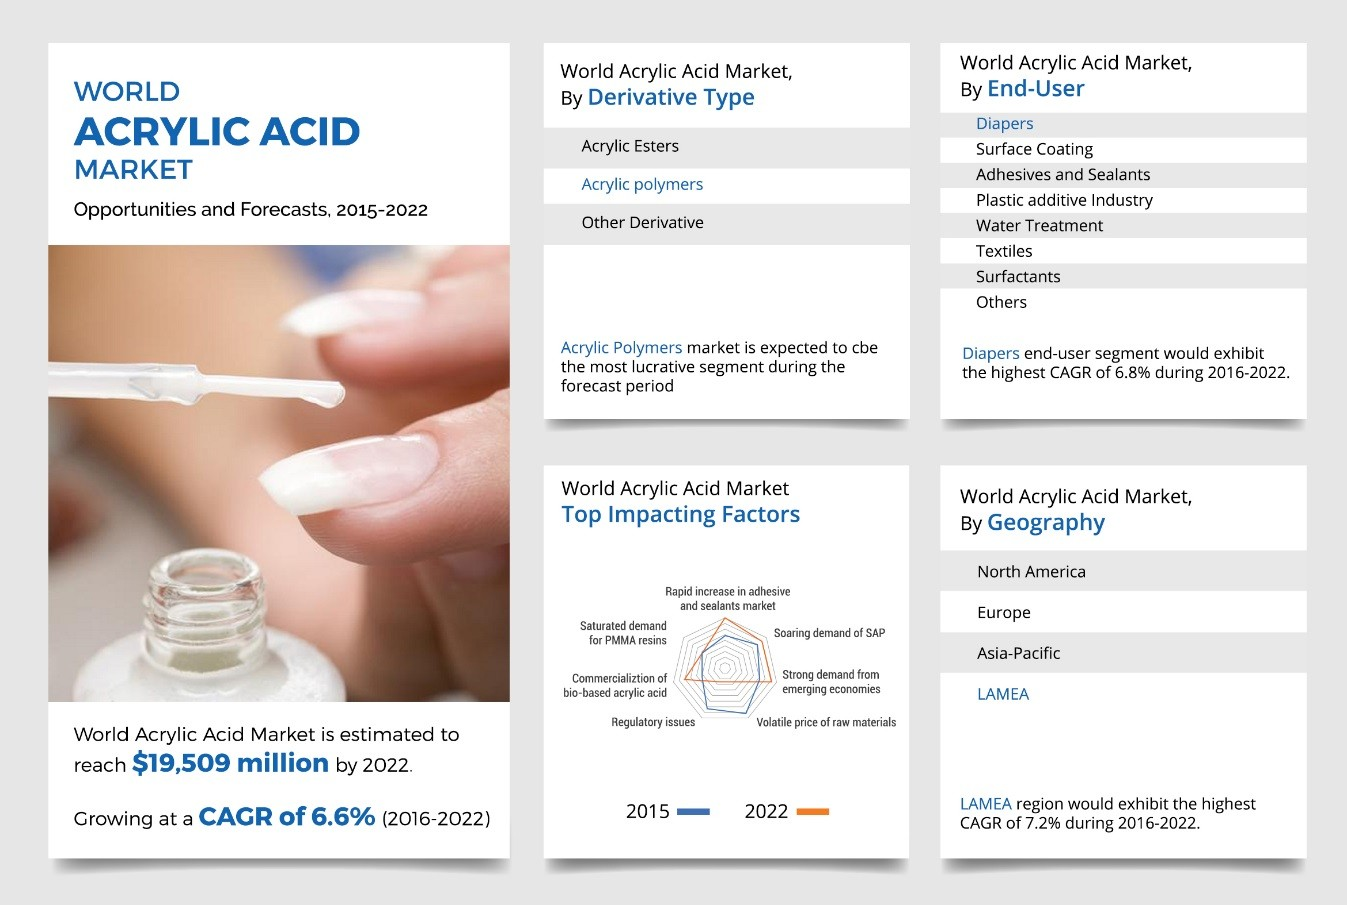 Acrylic Acid Market: Global Size, Trends & Analysis Report